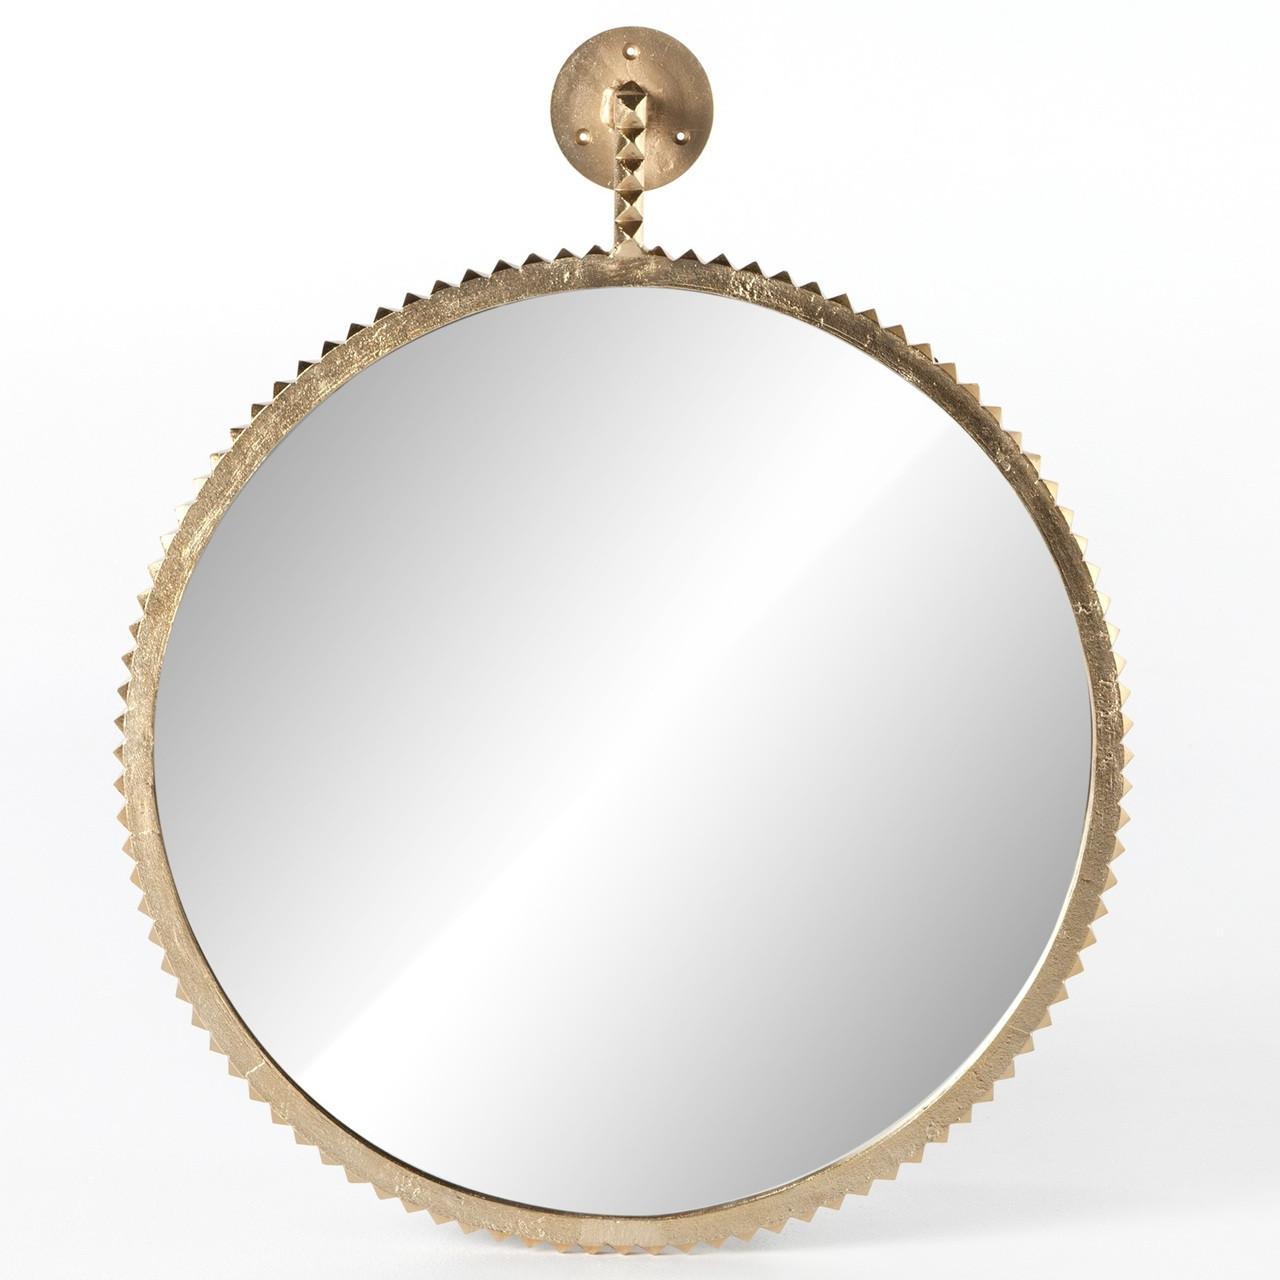 Cru Cast Aluminum Aged Gold Round Wall Mirror | Zin Home